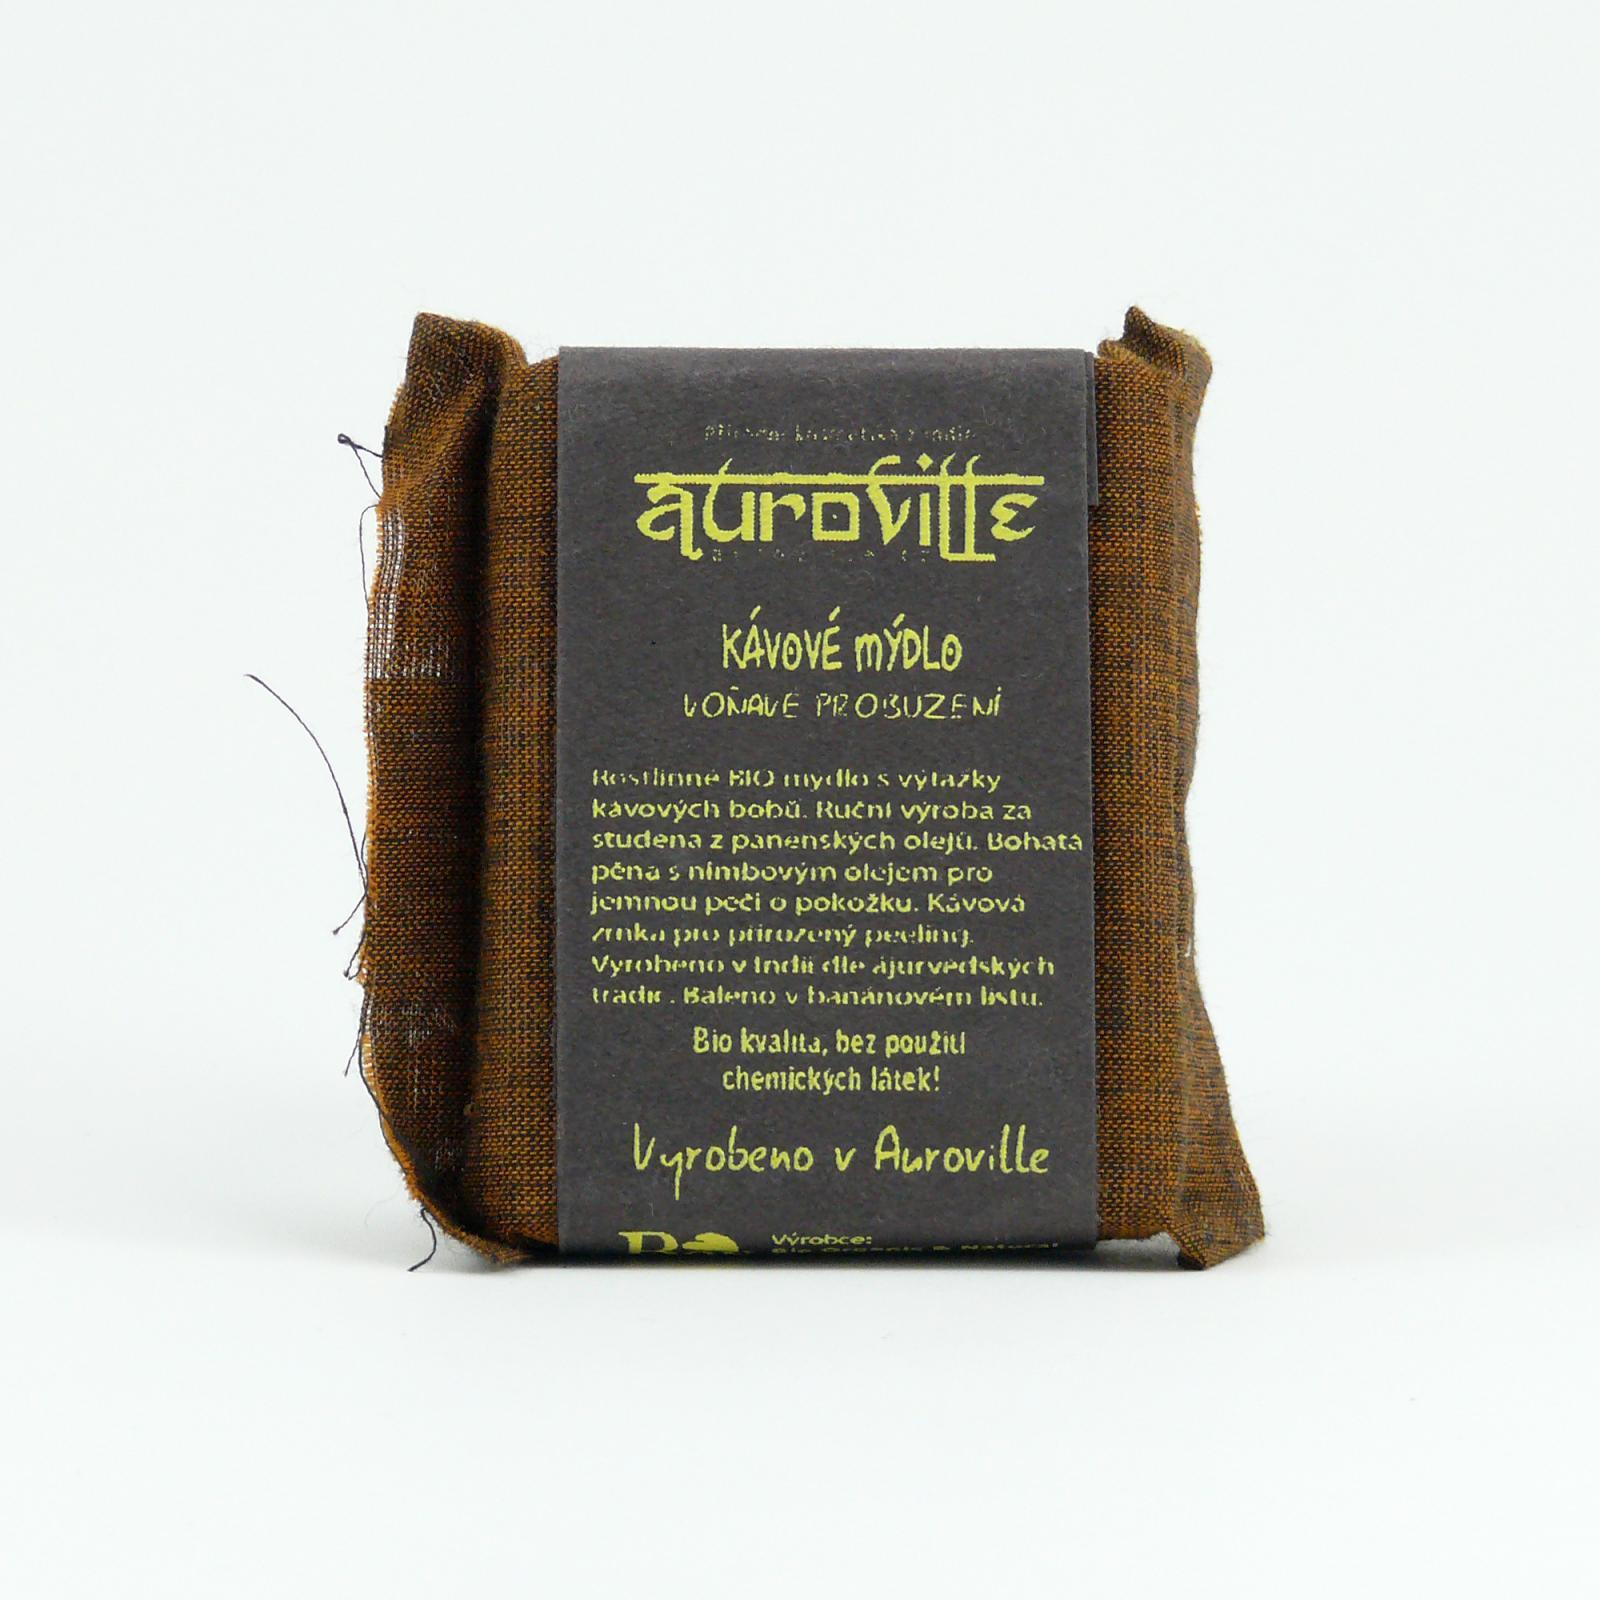 Auroville Mýdlo káva, Bon Auroville 50 g